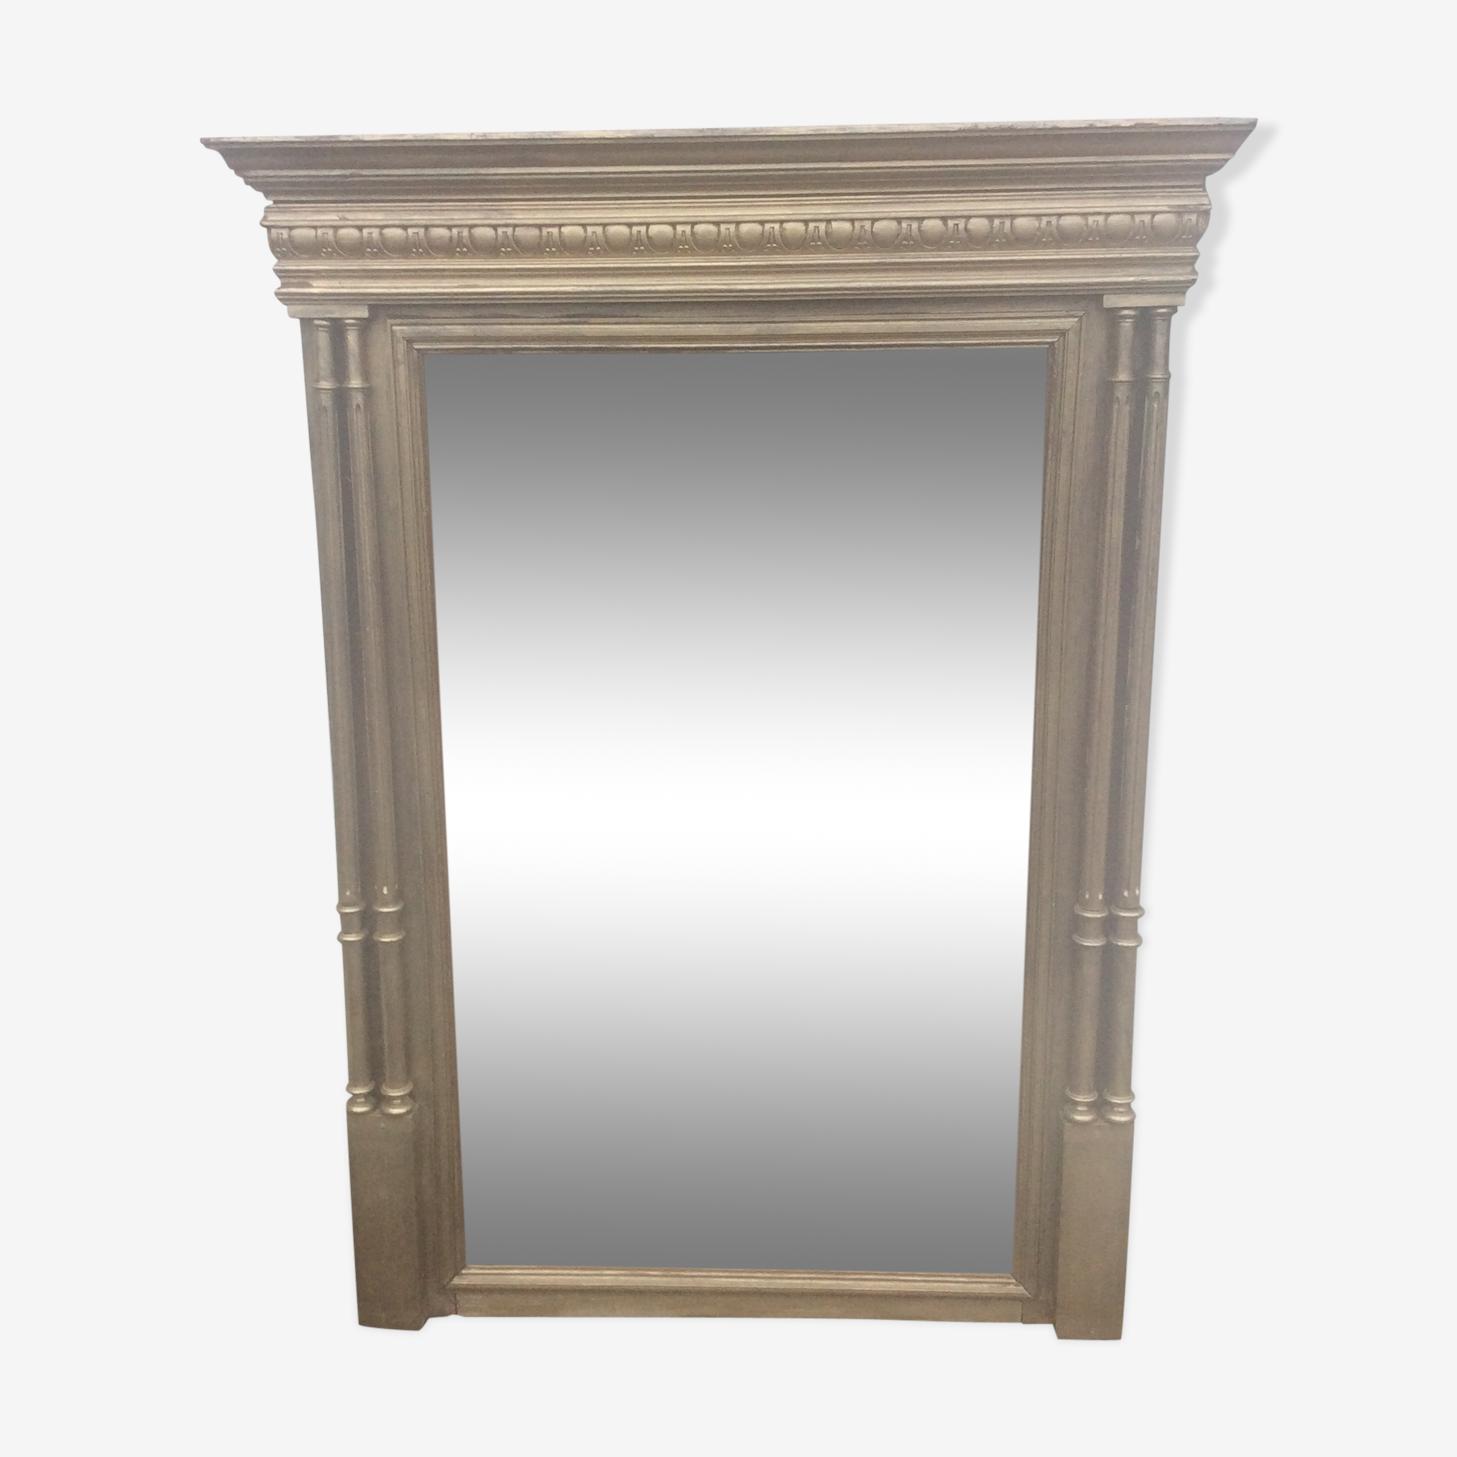 Louis Philippe mirror 88x117cm